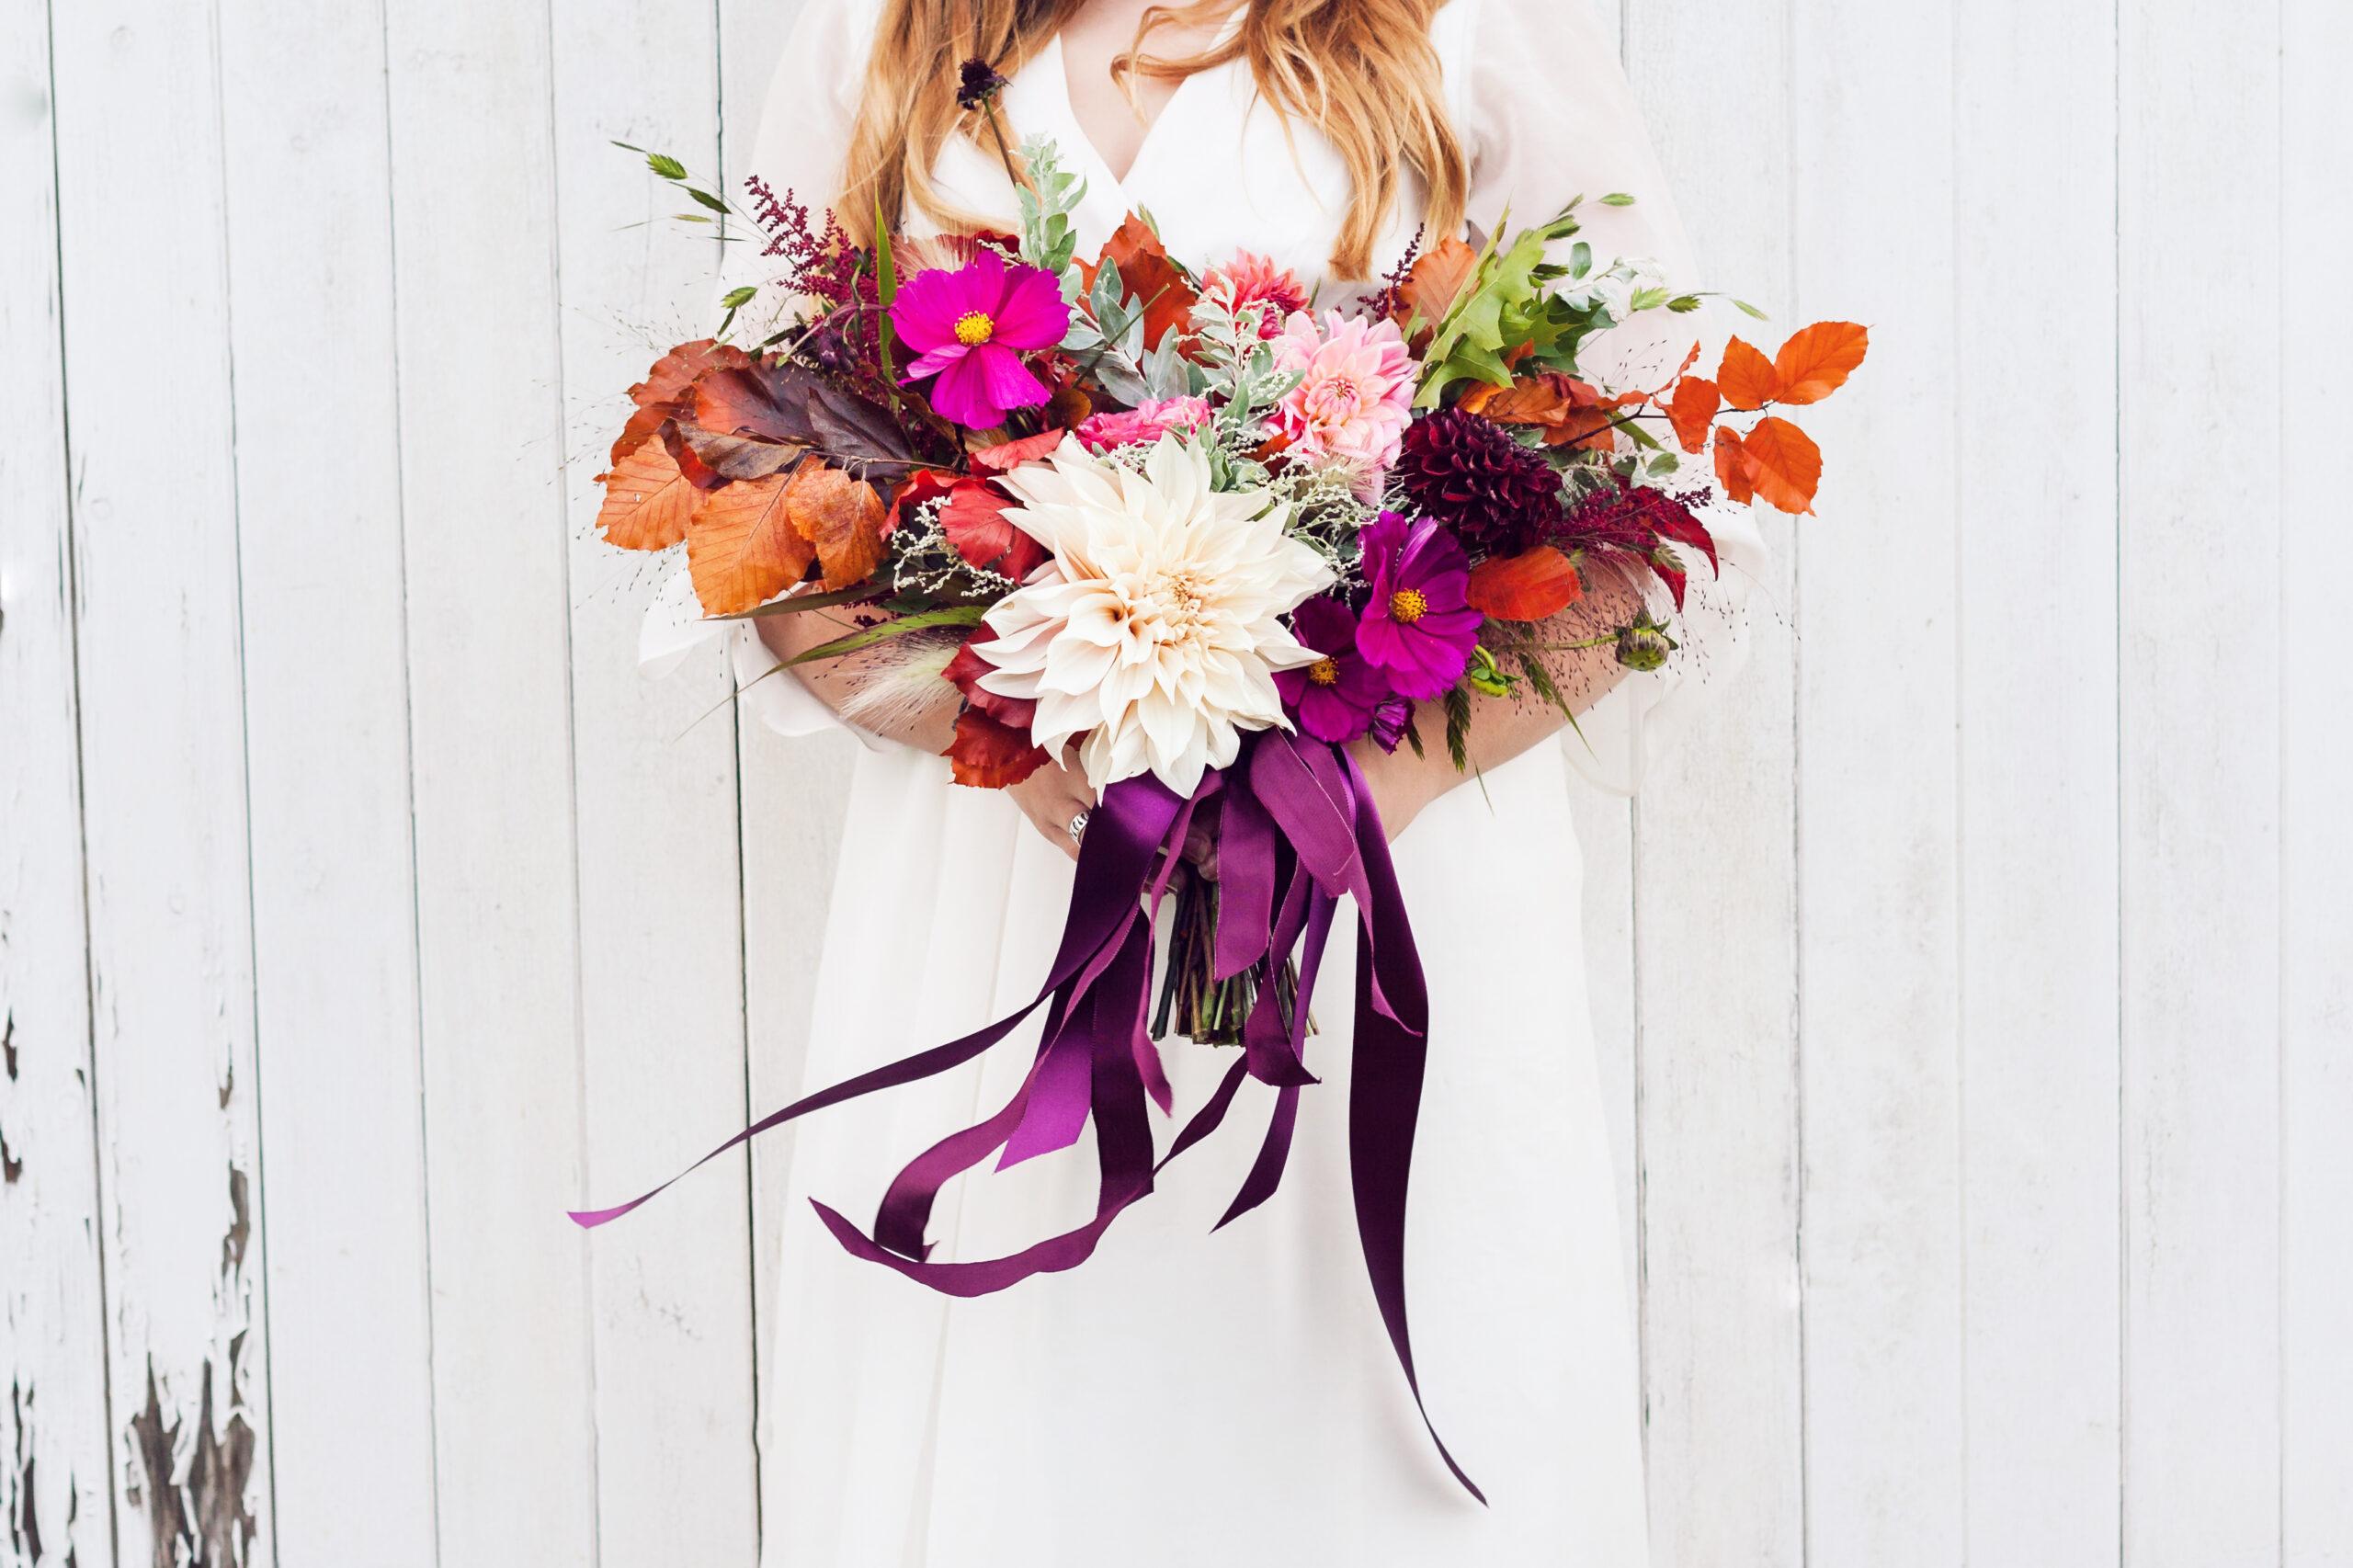 Gathered Style - Bloom Room Studio LTD - Wild Bridal Bouquet - Photo Credit Katie Spicer